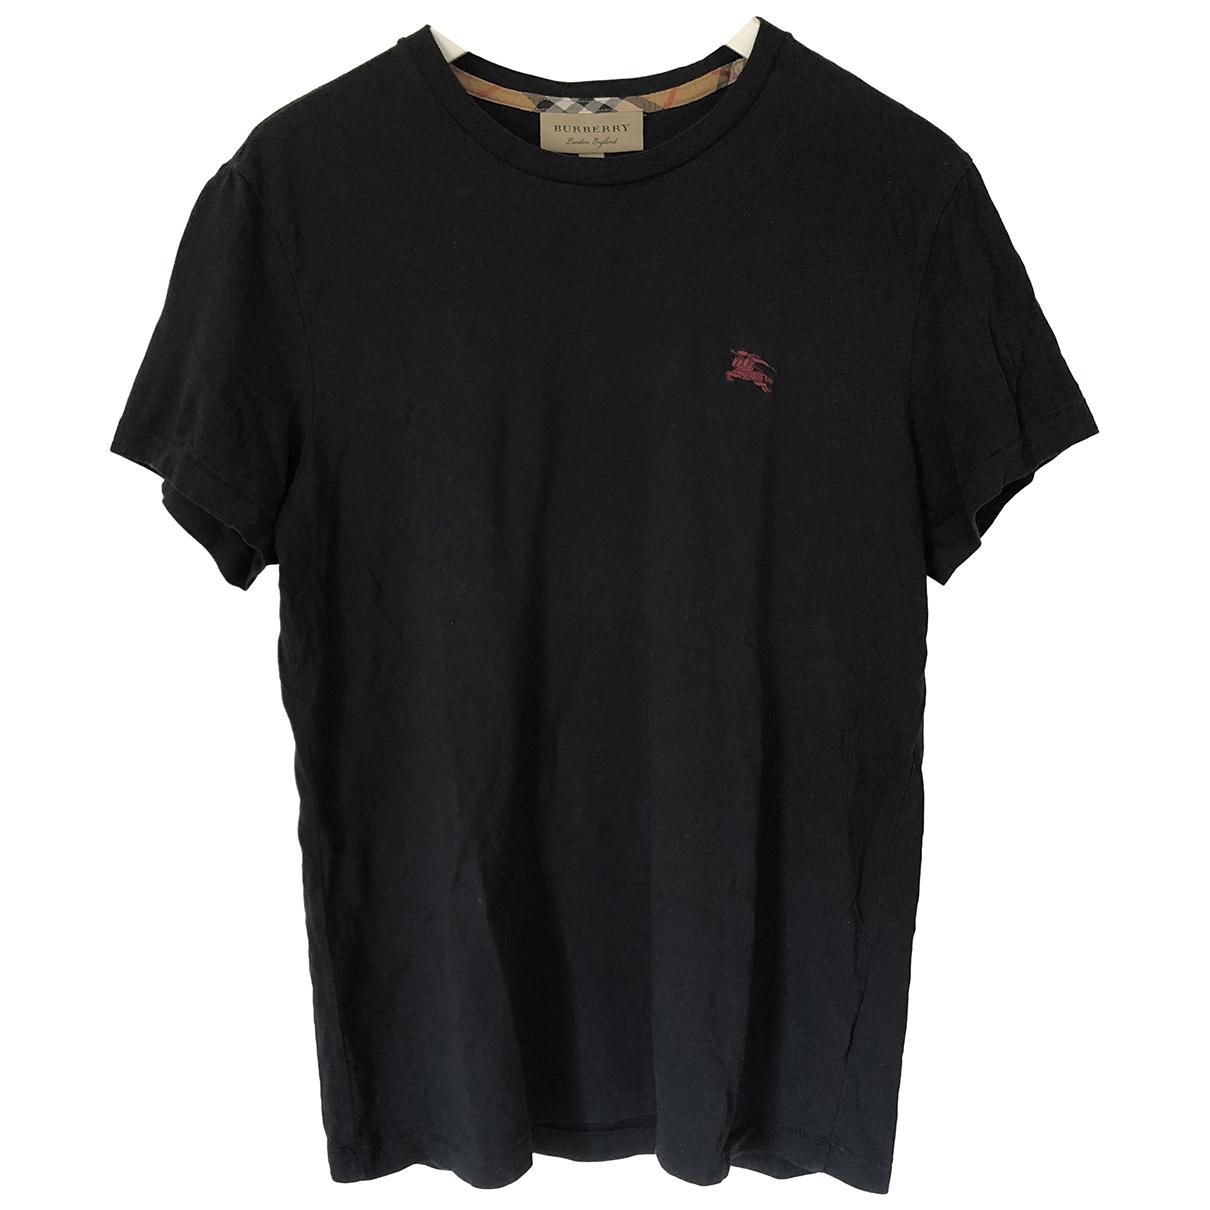 Burberry \N Black Cotton T-shirts for Men M International